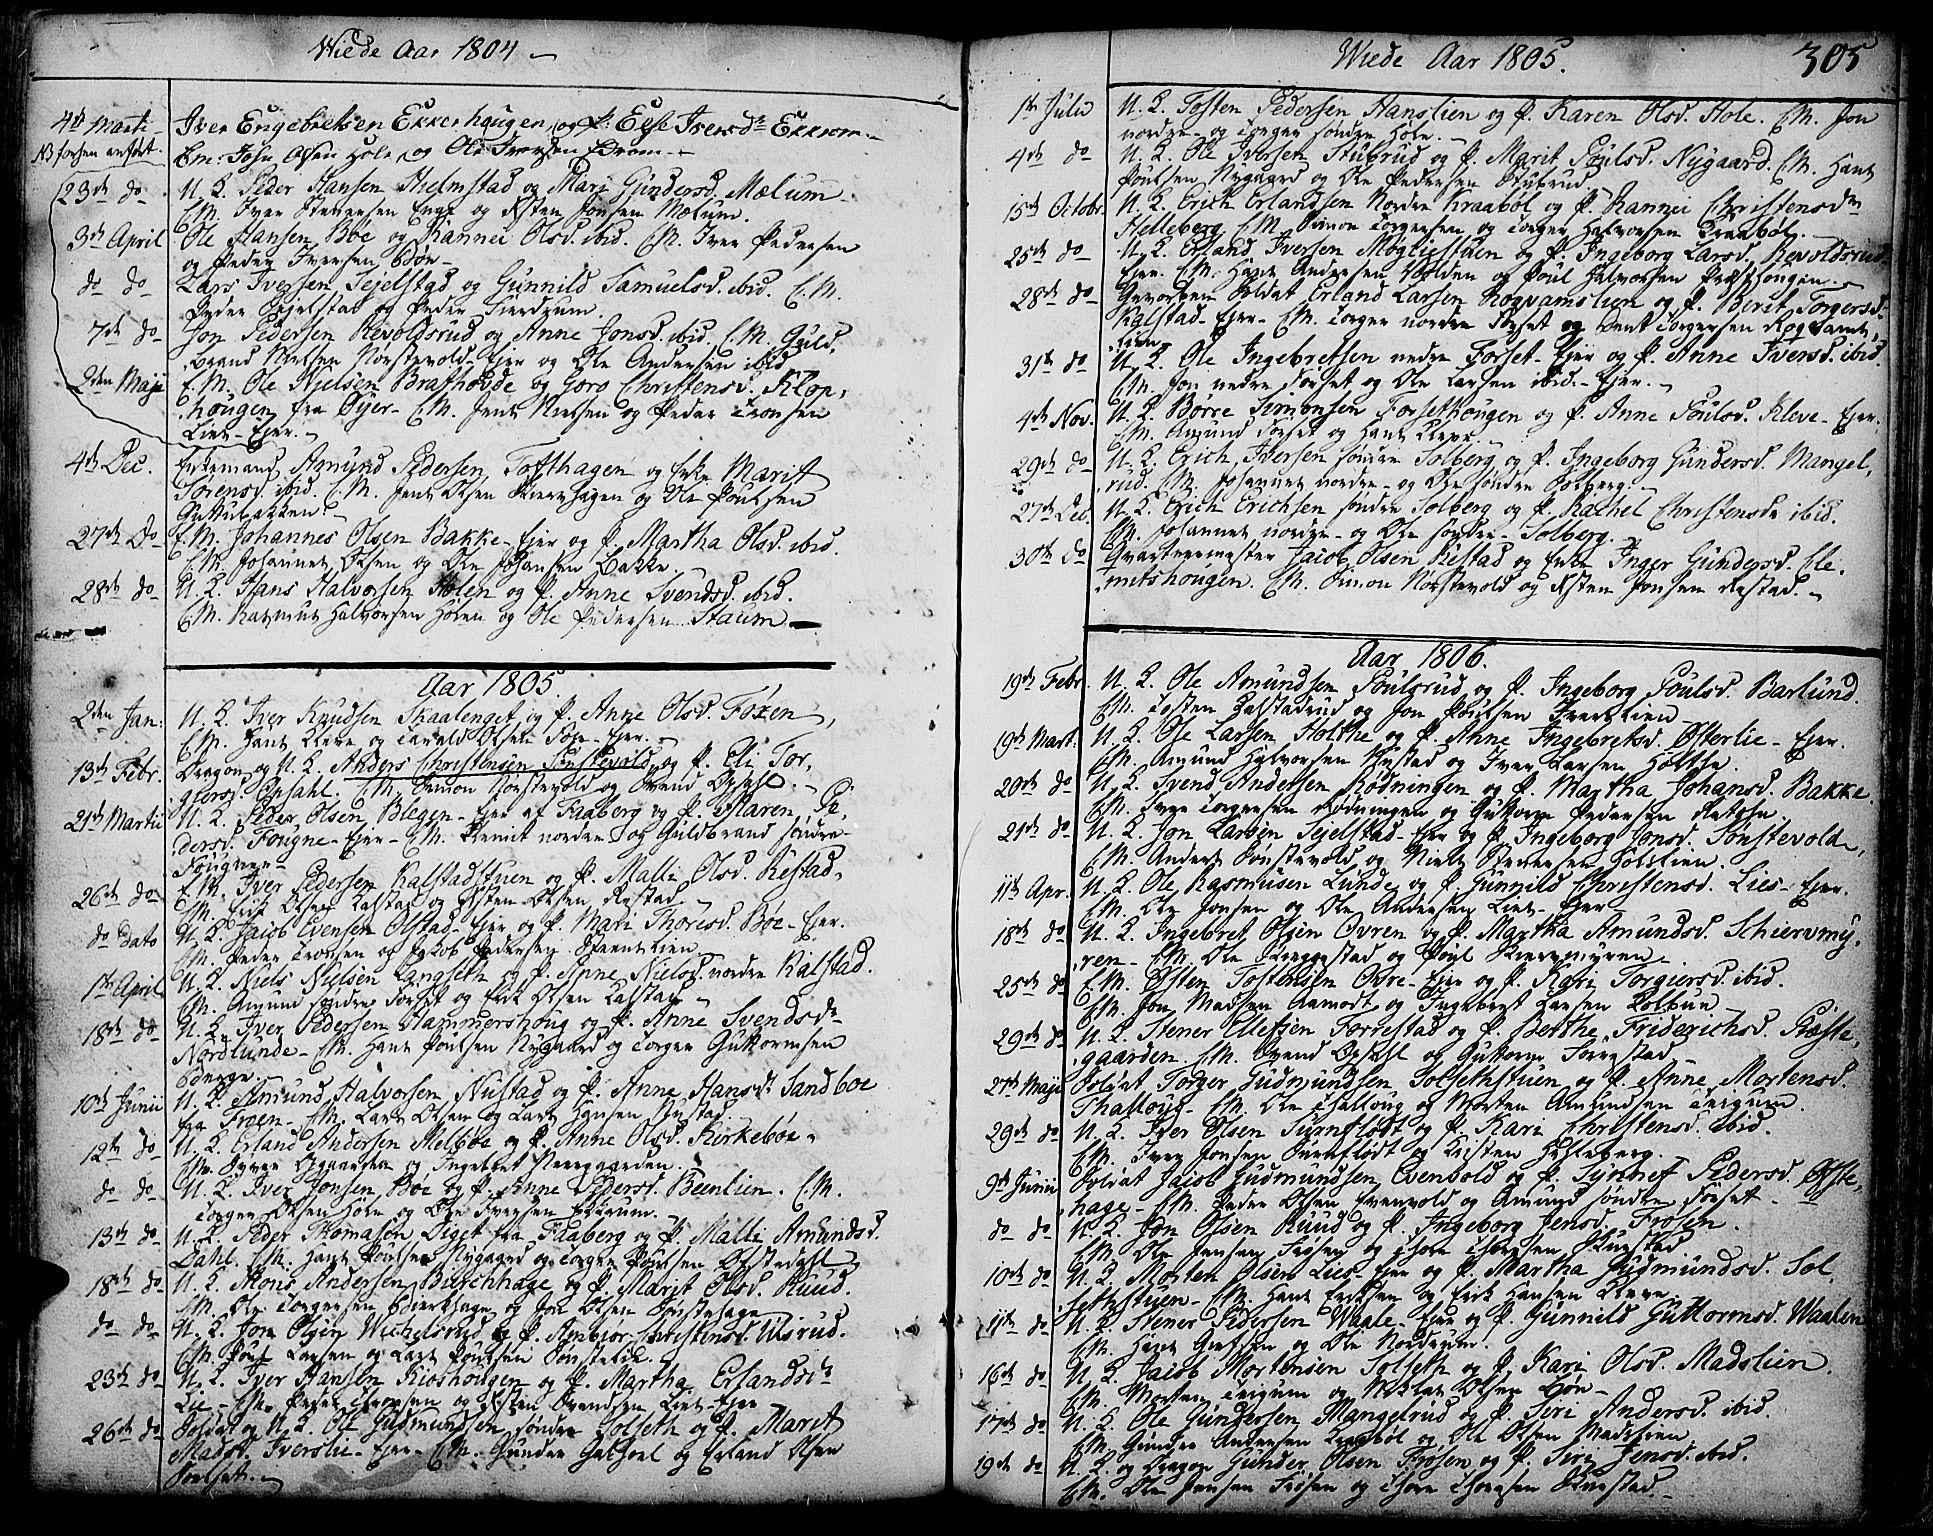 SAH, Gausdal prestekontor, Ministerialbok nr. 3, 1758-1809, s. 305